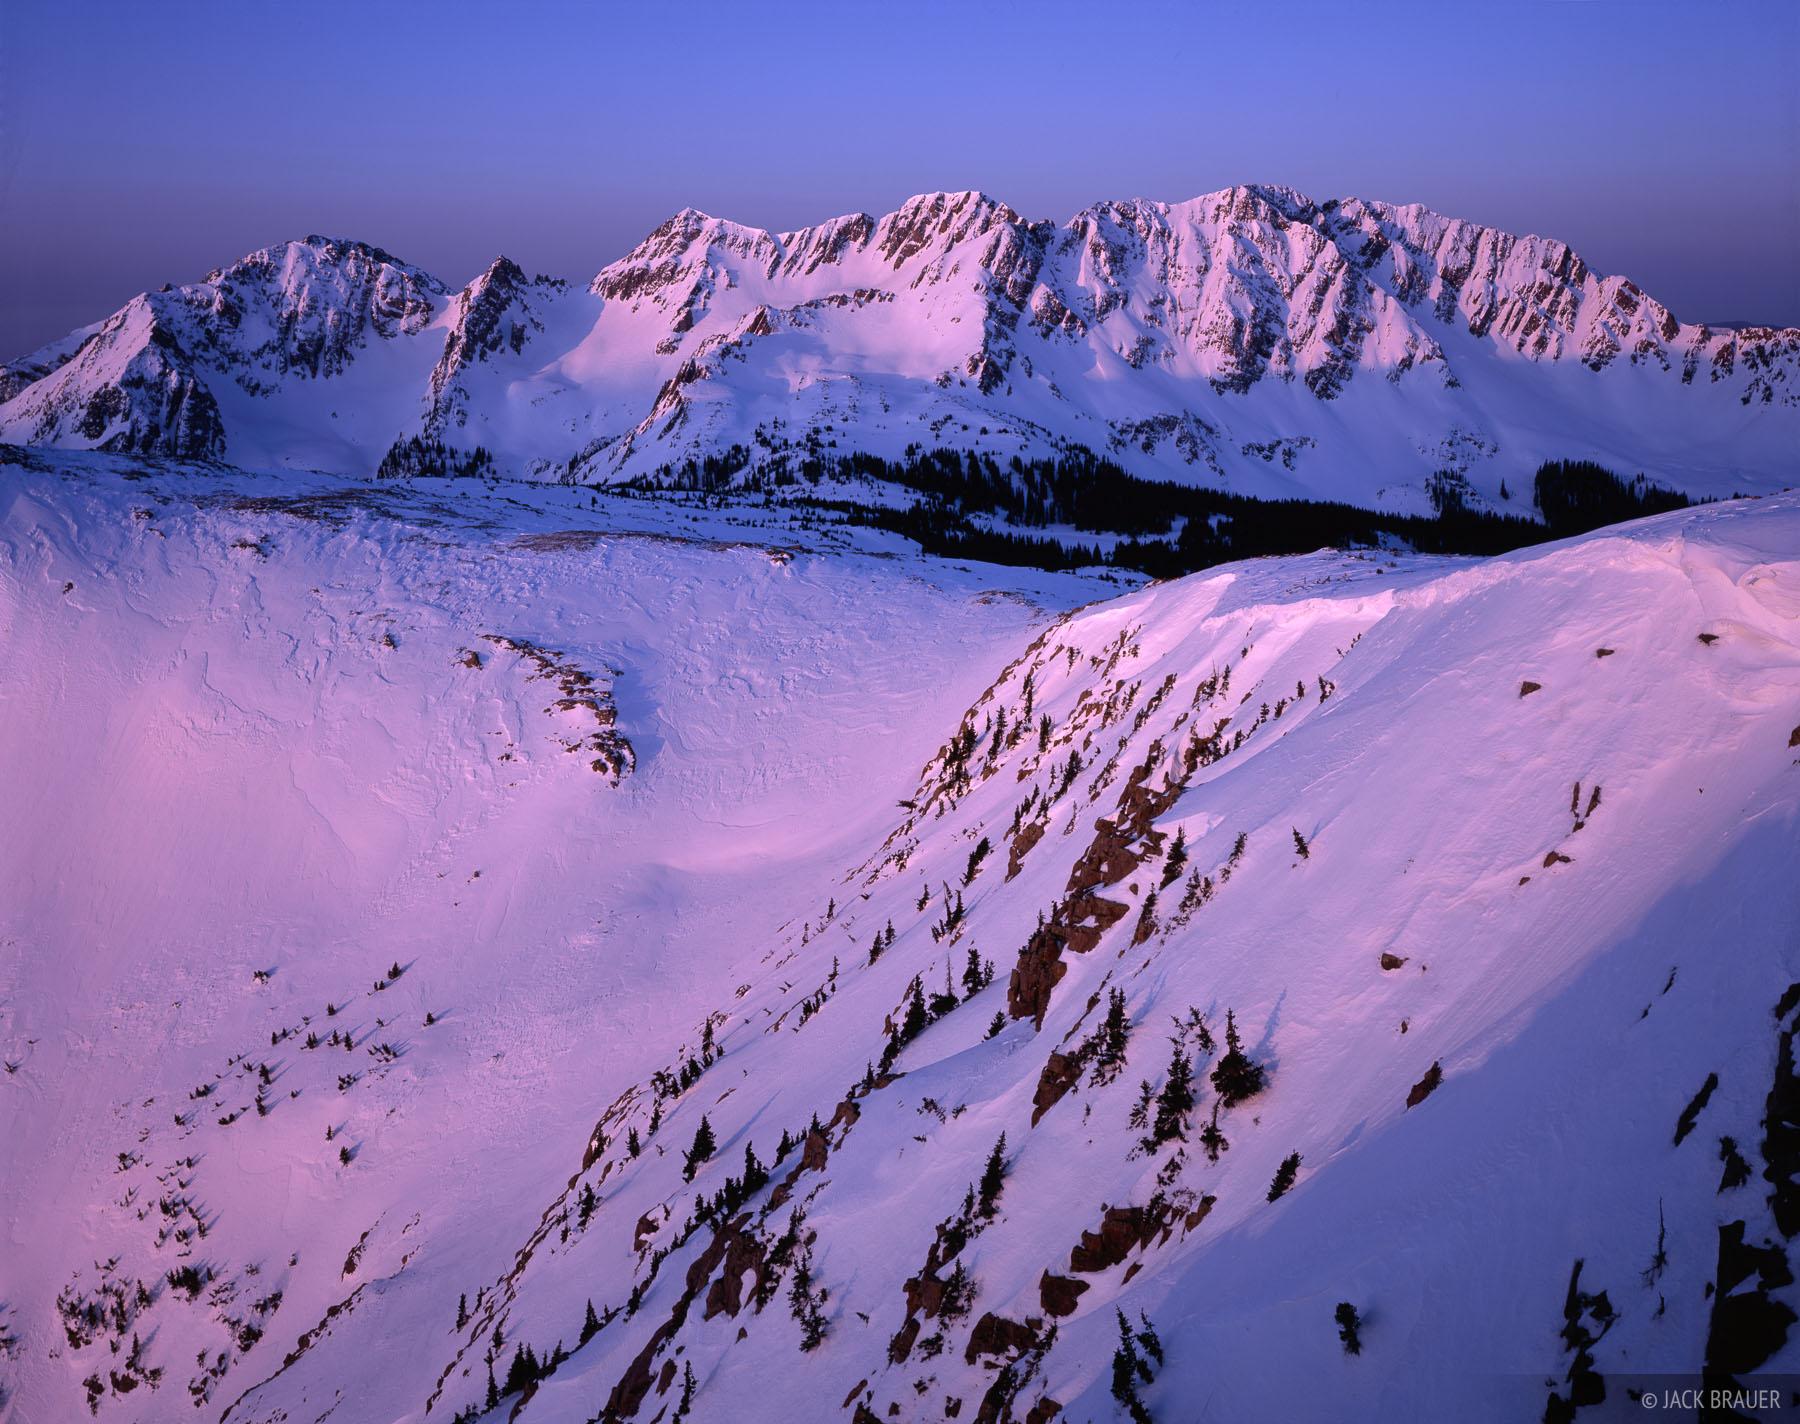 North Twilight Peak, San Juans, Colorado, photo